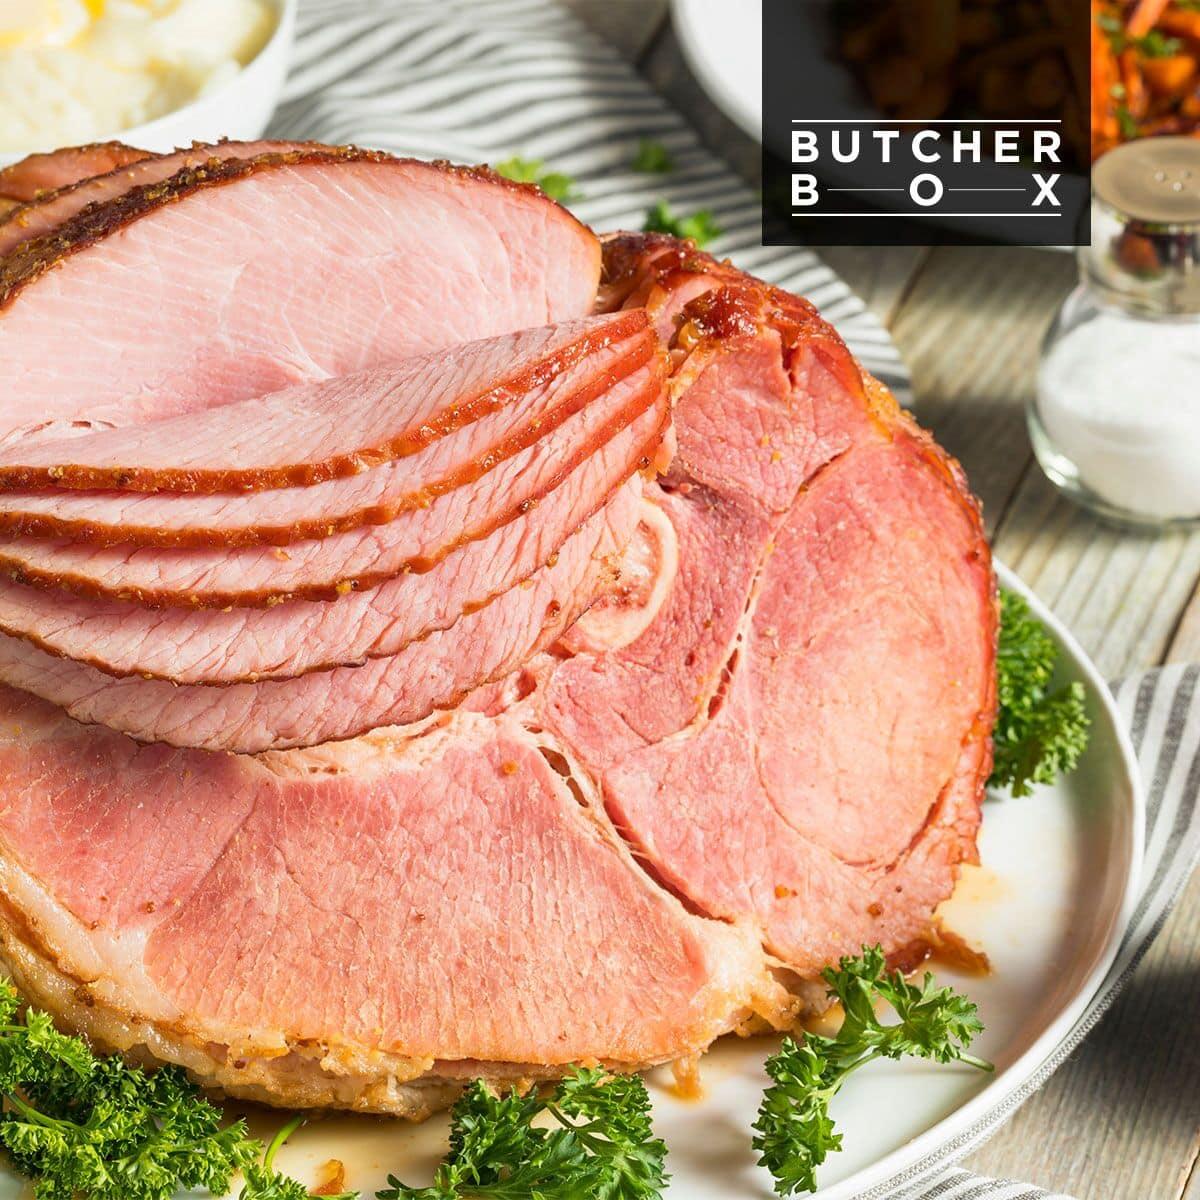 Ham from Butcher Box